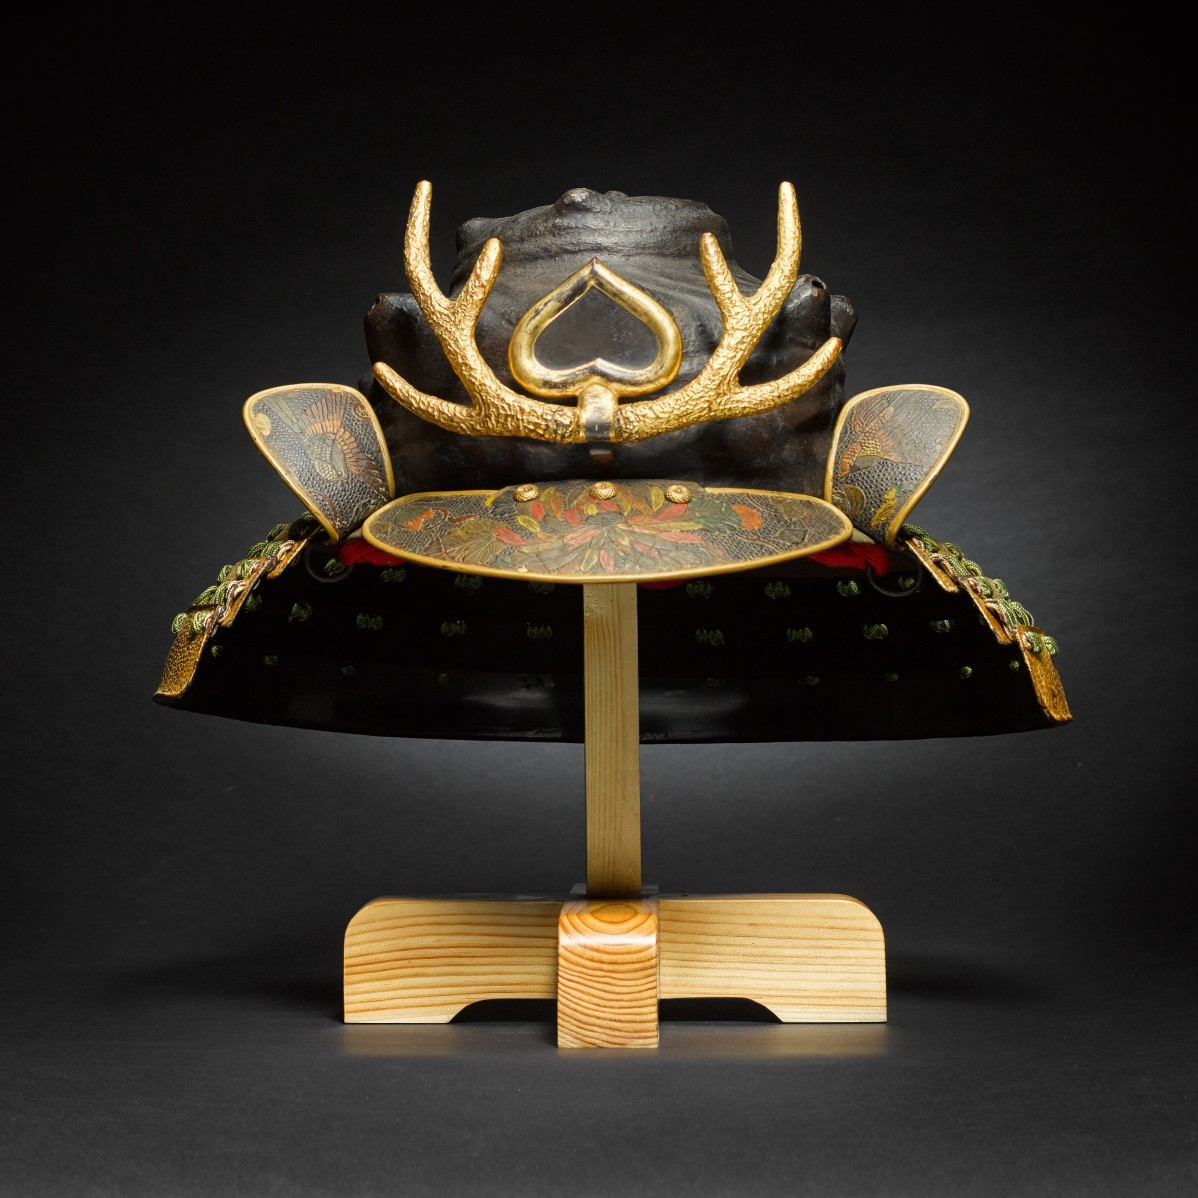 A Kawari kabuto [unusually shaped helmet] Edo period, 17th – 18th century